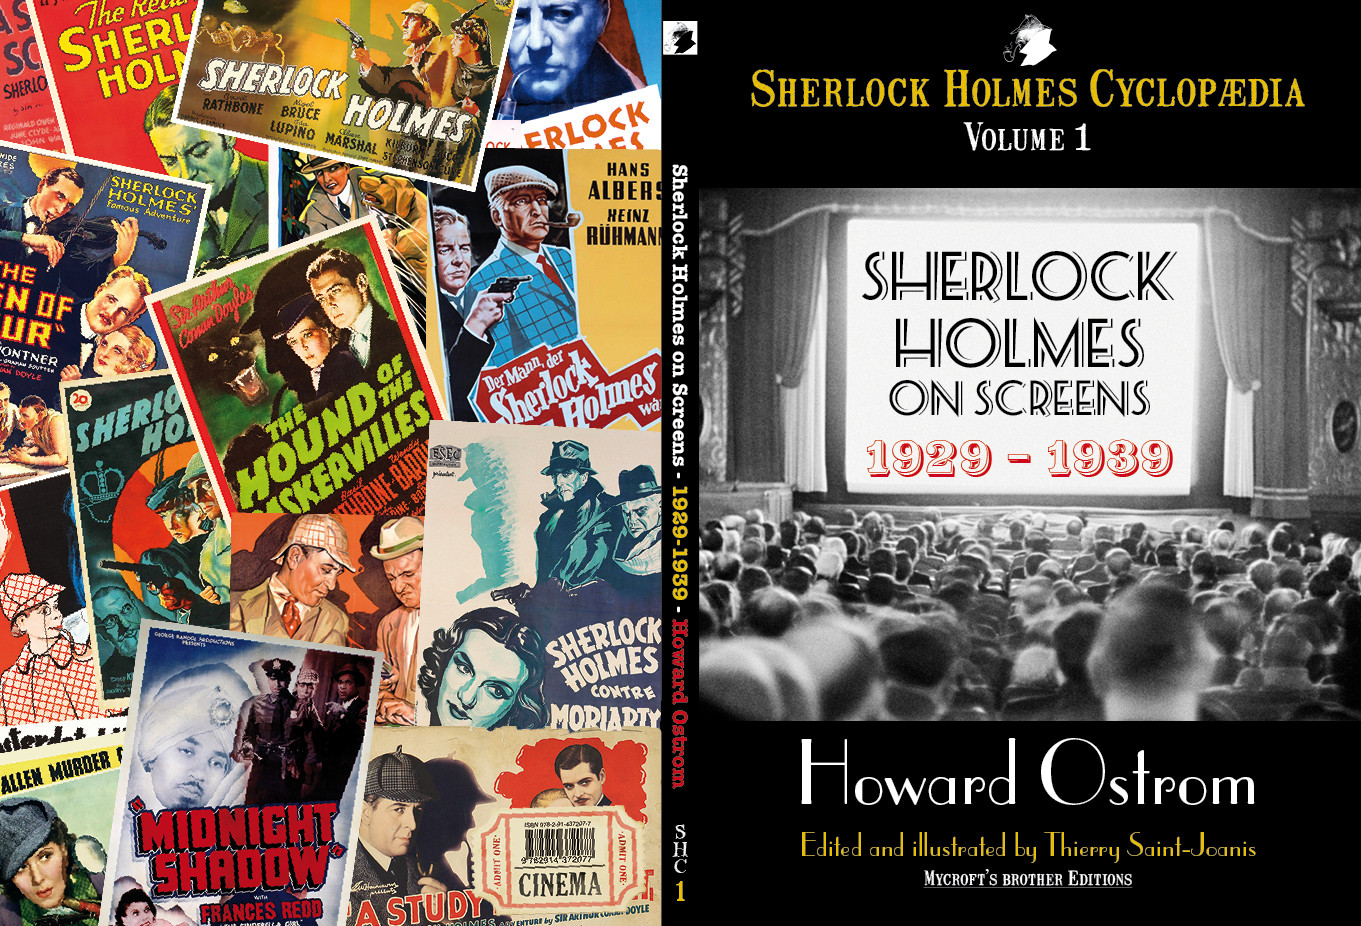 web-1-4-Sherlock Holmes on Screens-1.jpg